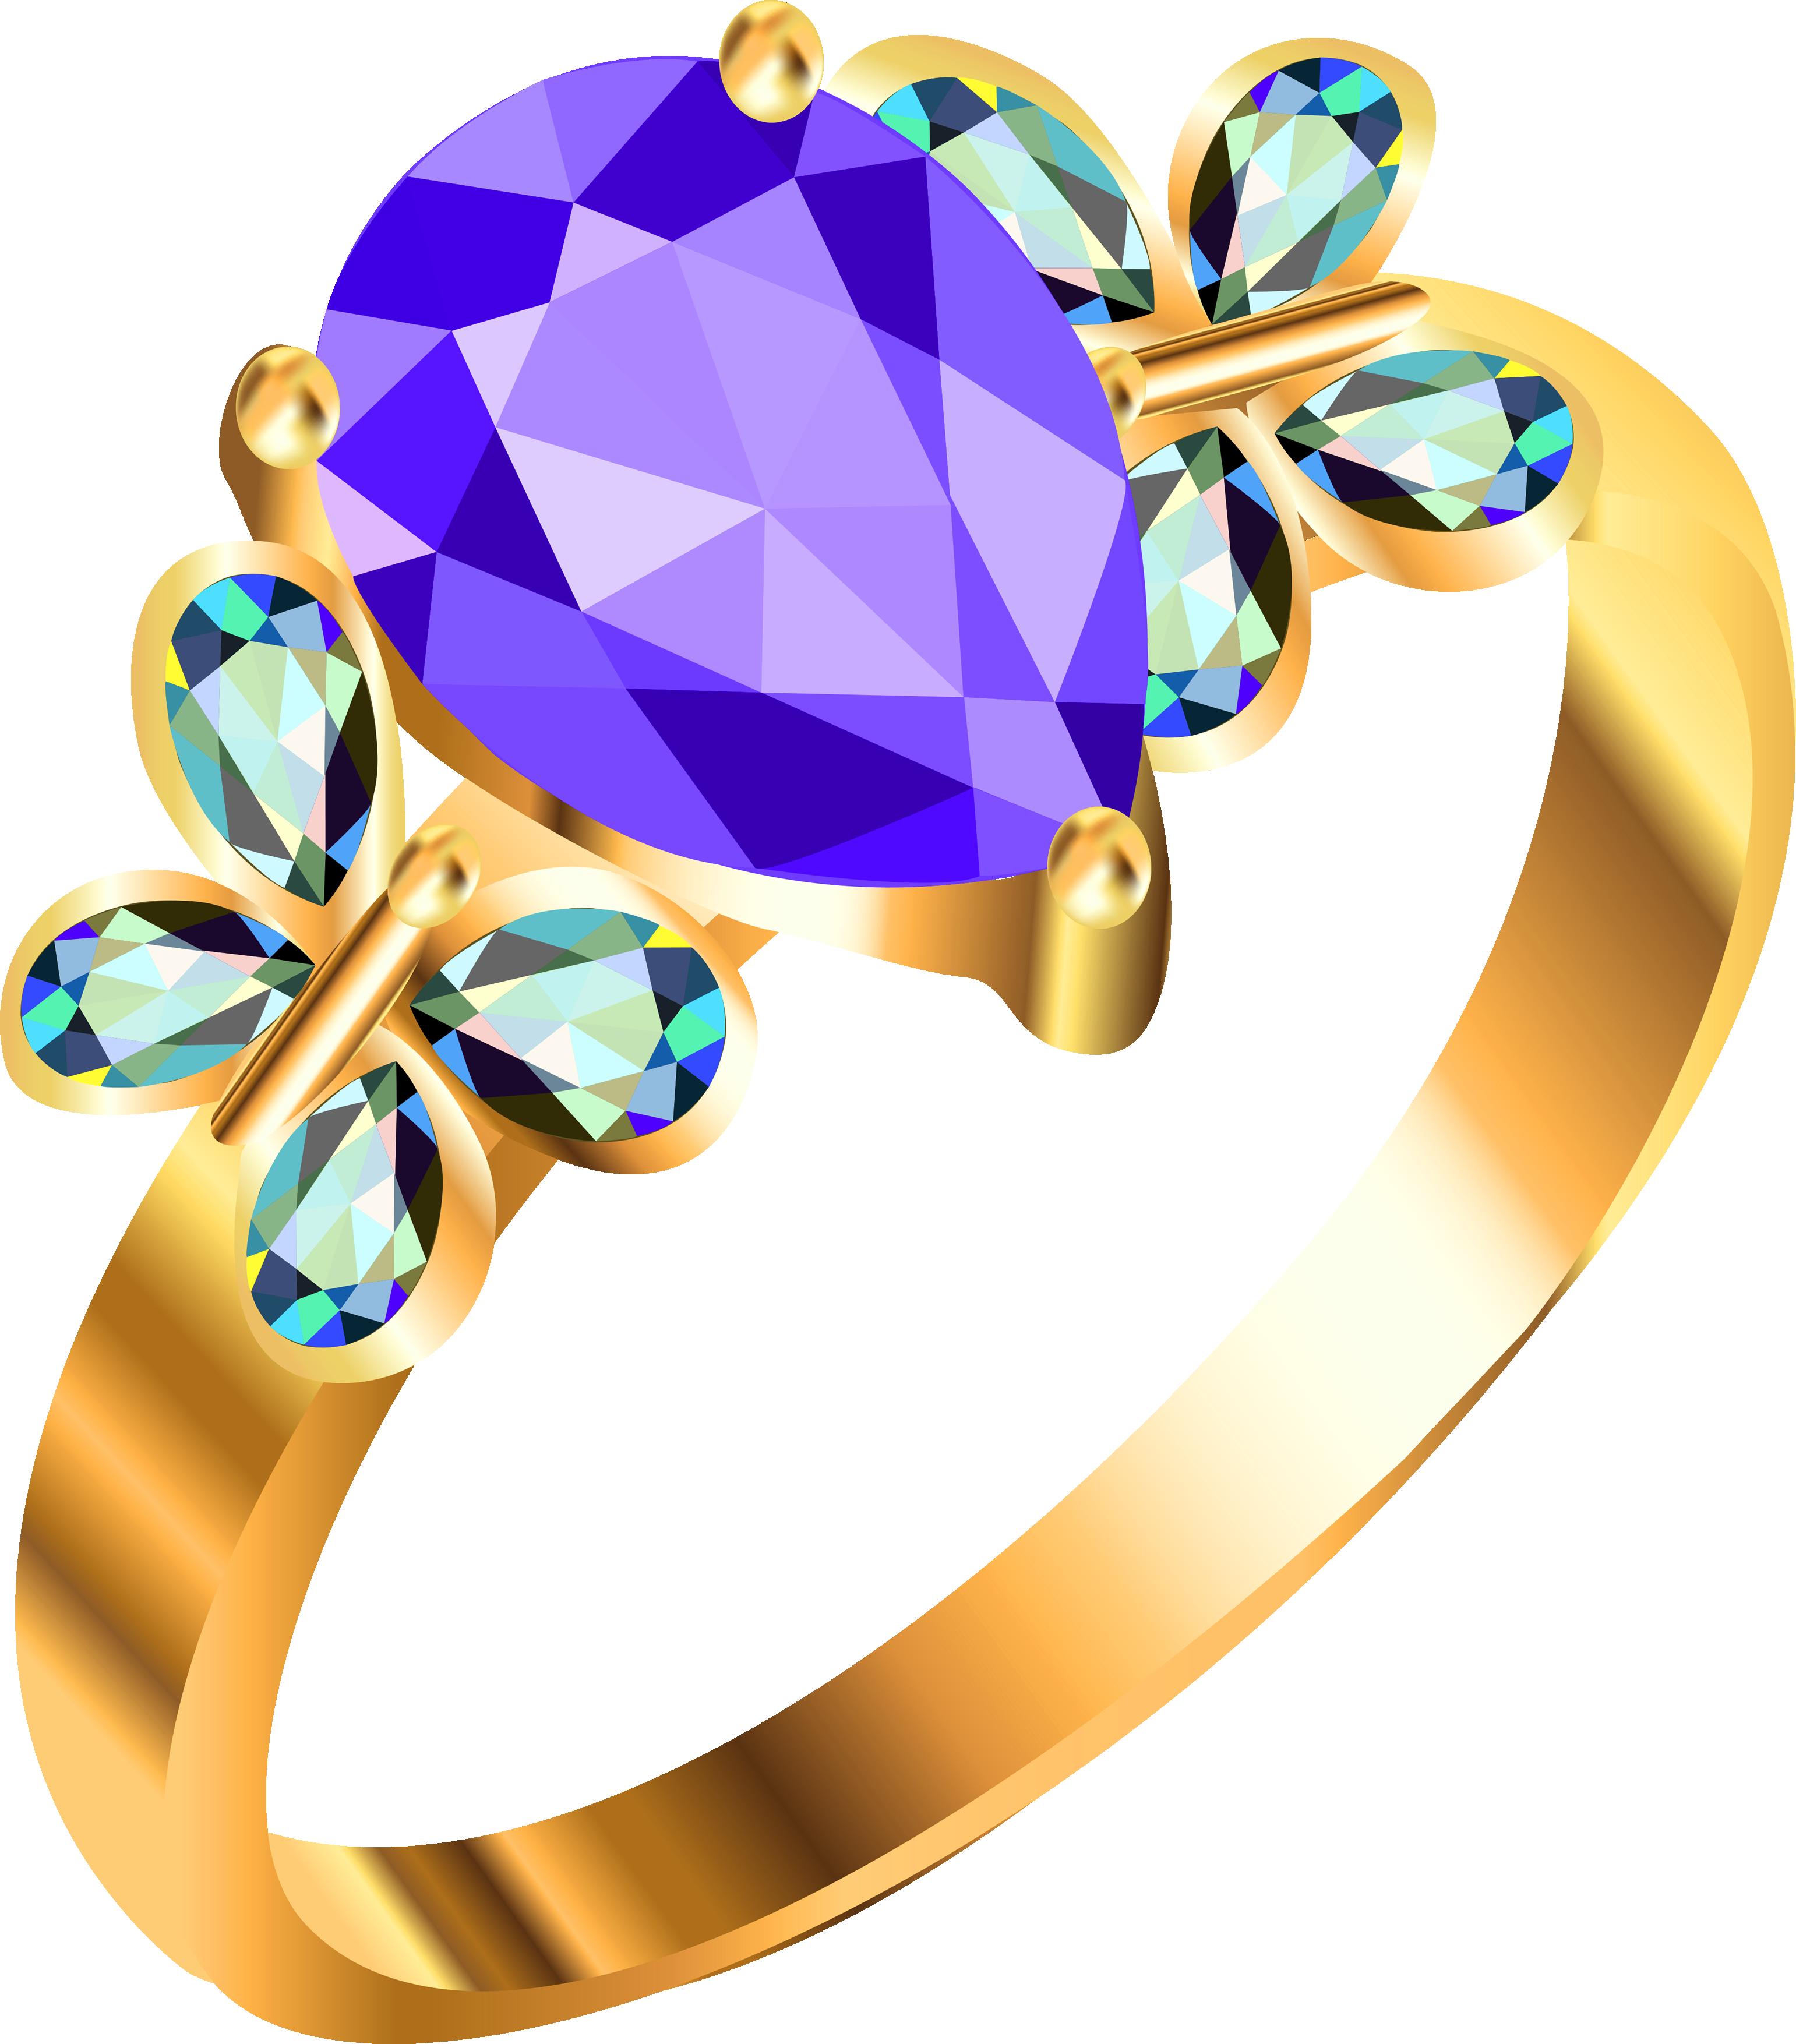 3083x3509 Clipart Jewelry